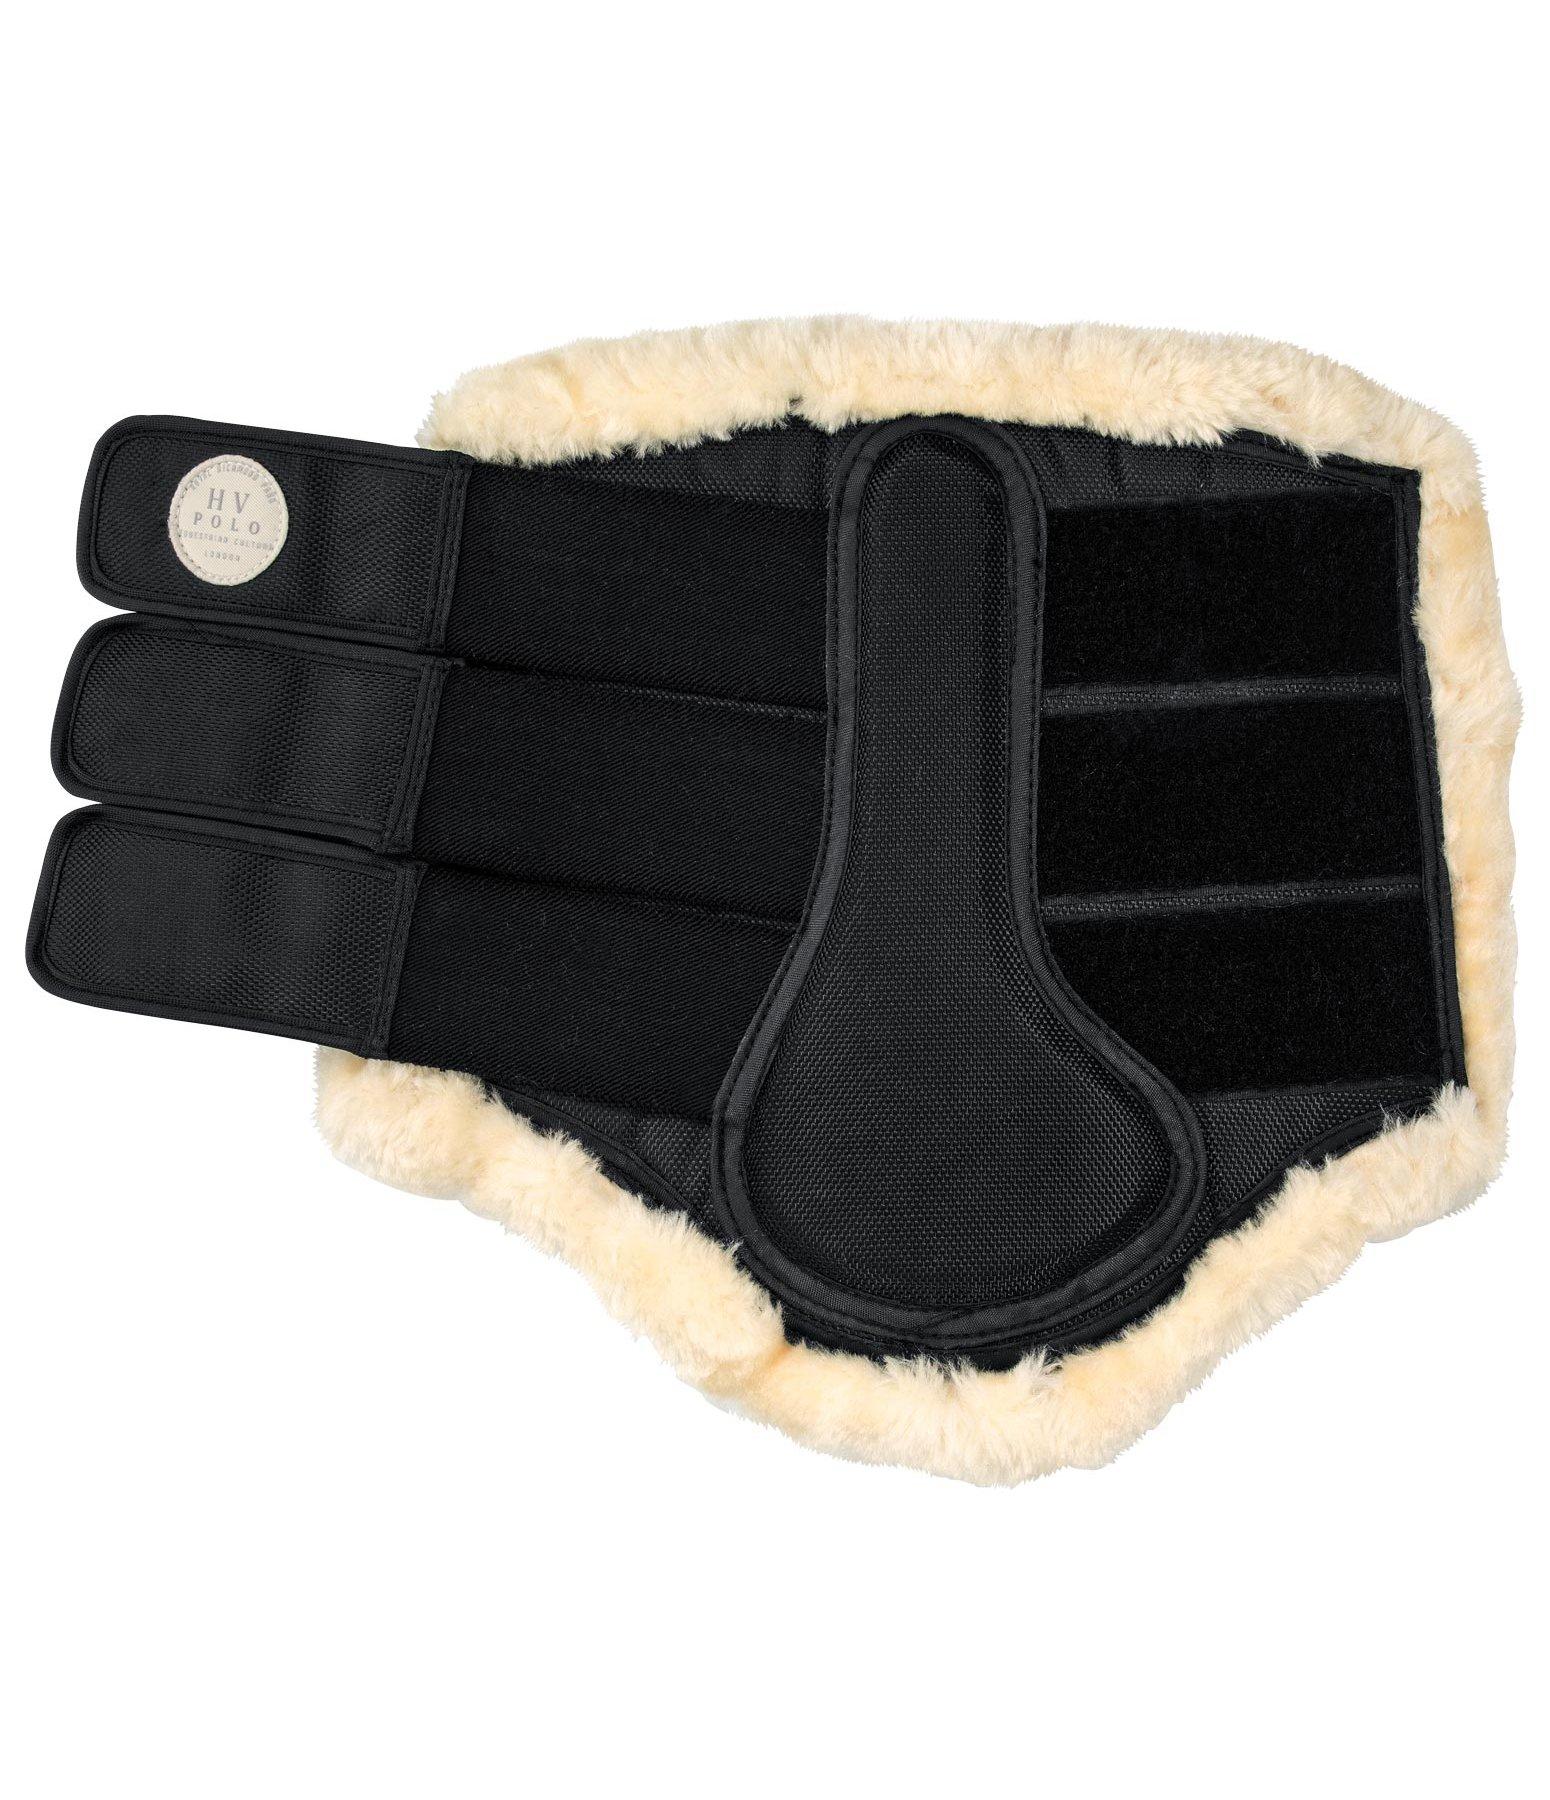 5a2ba22af9 Teddy Fleece Dressage Boots Joya - Boots - Kramer Equestrian